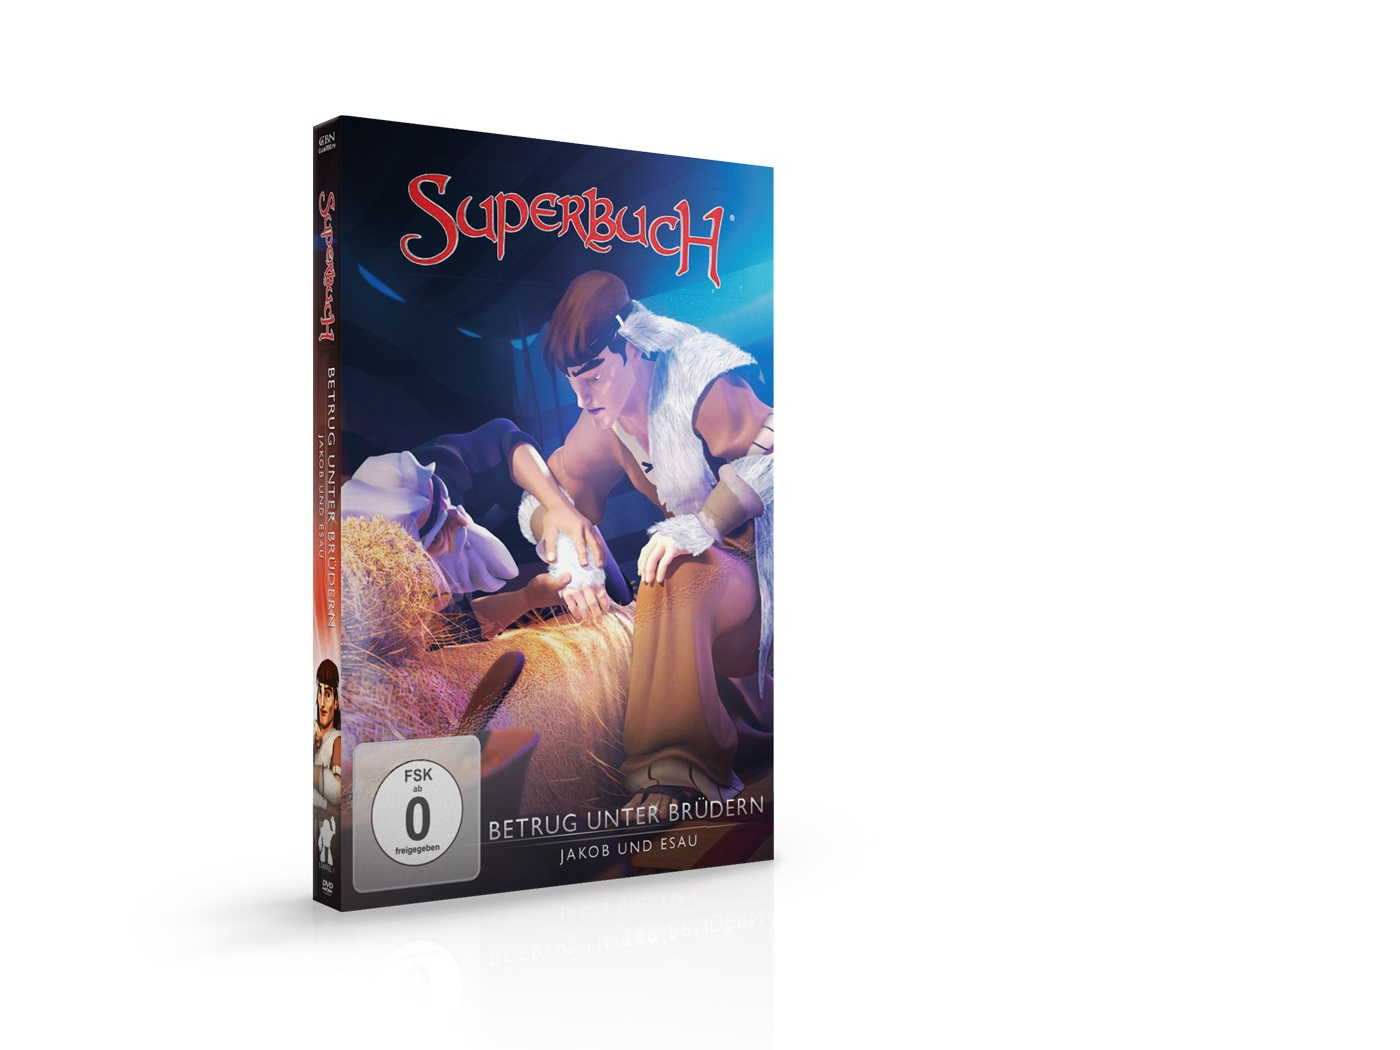 Superbuch – Betrug unter Brüdern